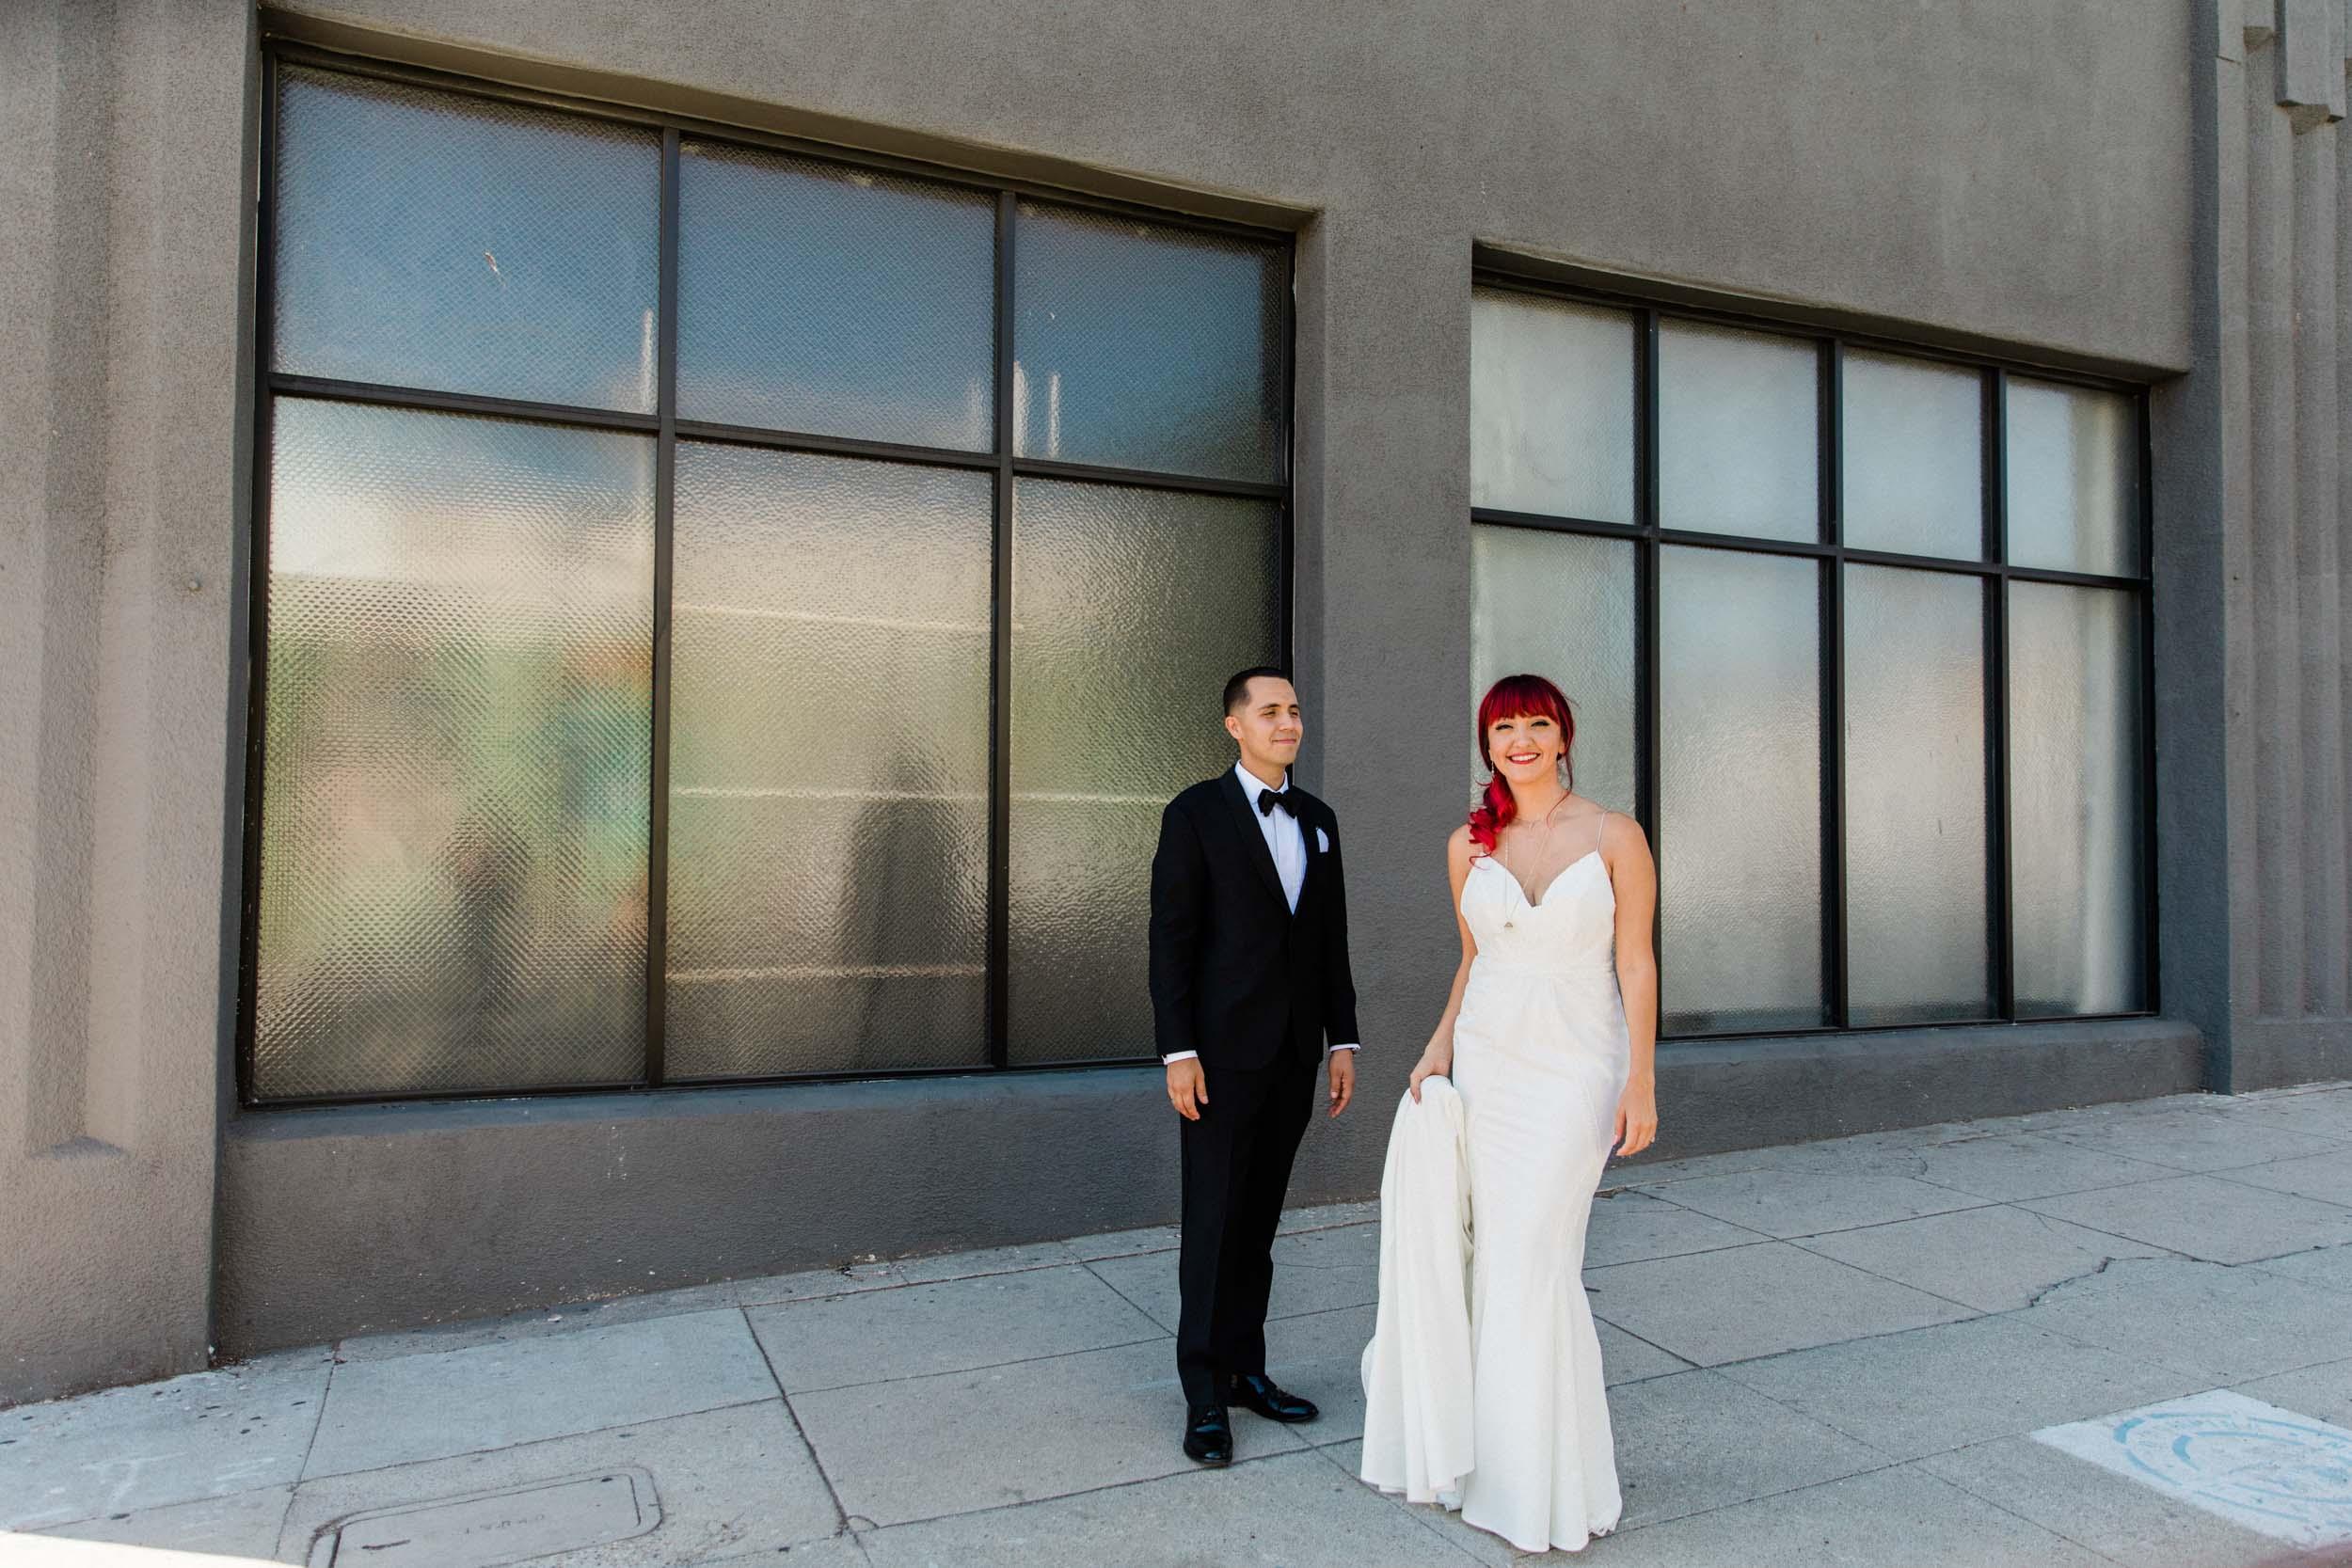 BKM-Photography-Los-Angeles-Highland-Park-York-Manor-Wedding-Photography-0312.jpg